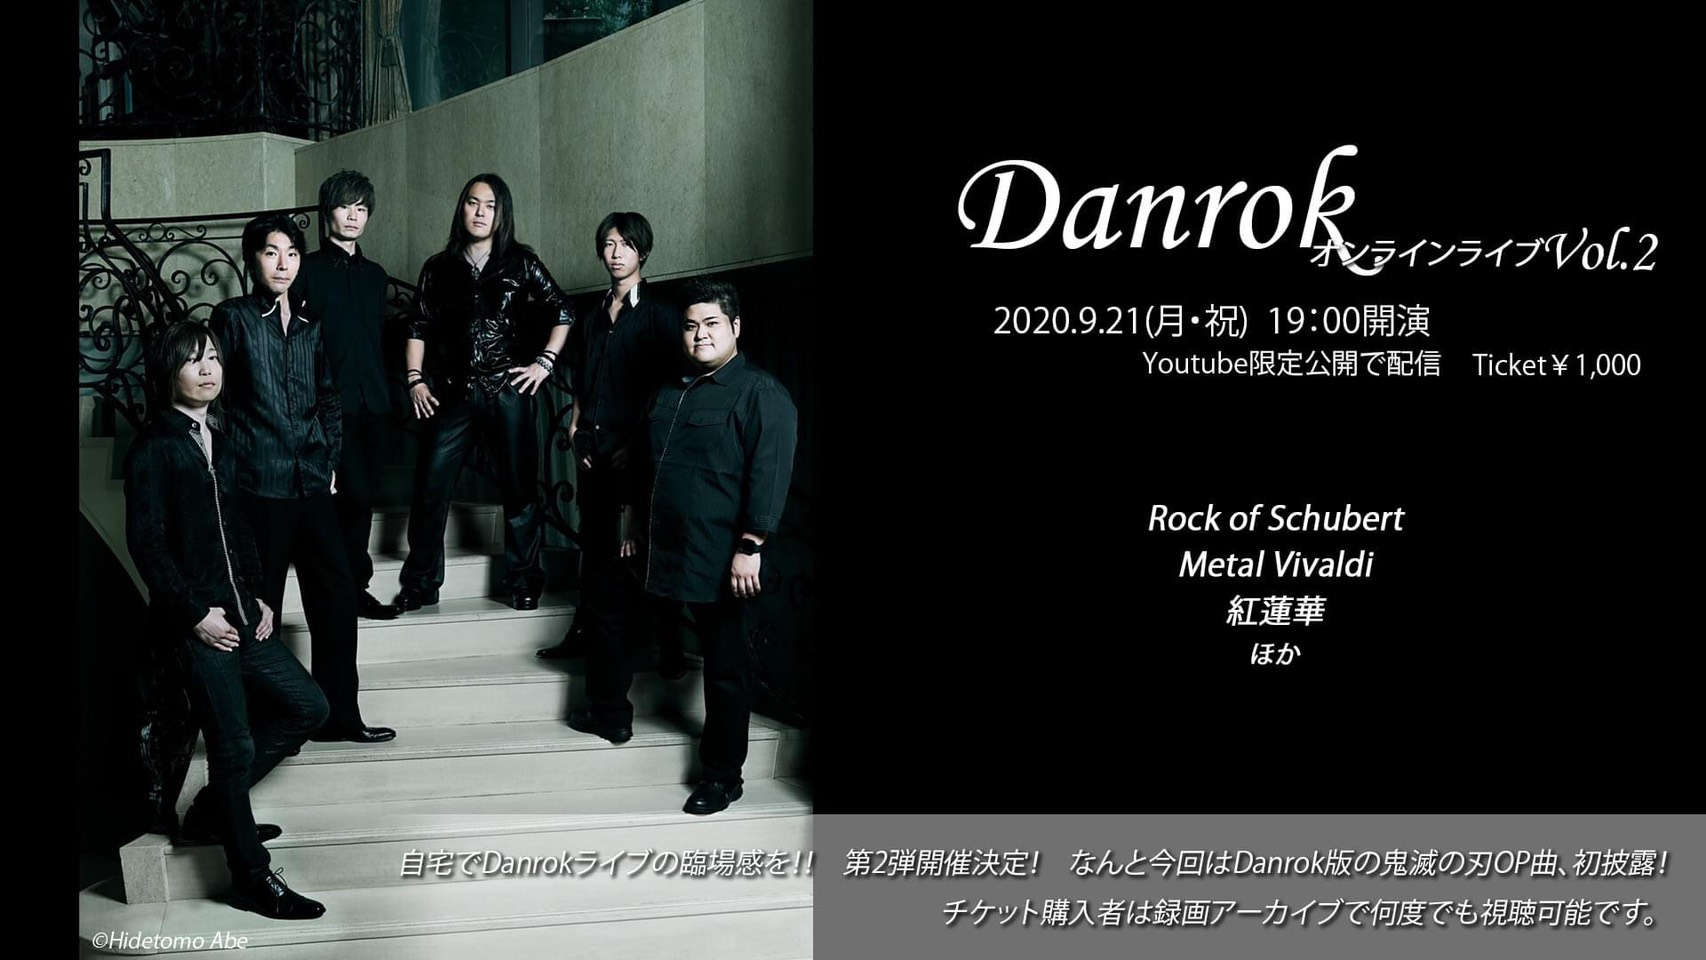 【DANROKオンラインコンサートVol.2】9月21日(月・祝)19時